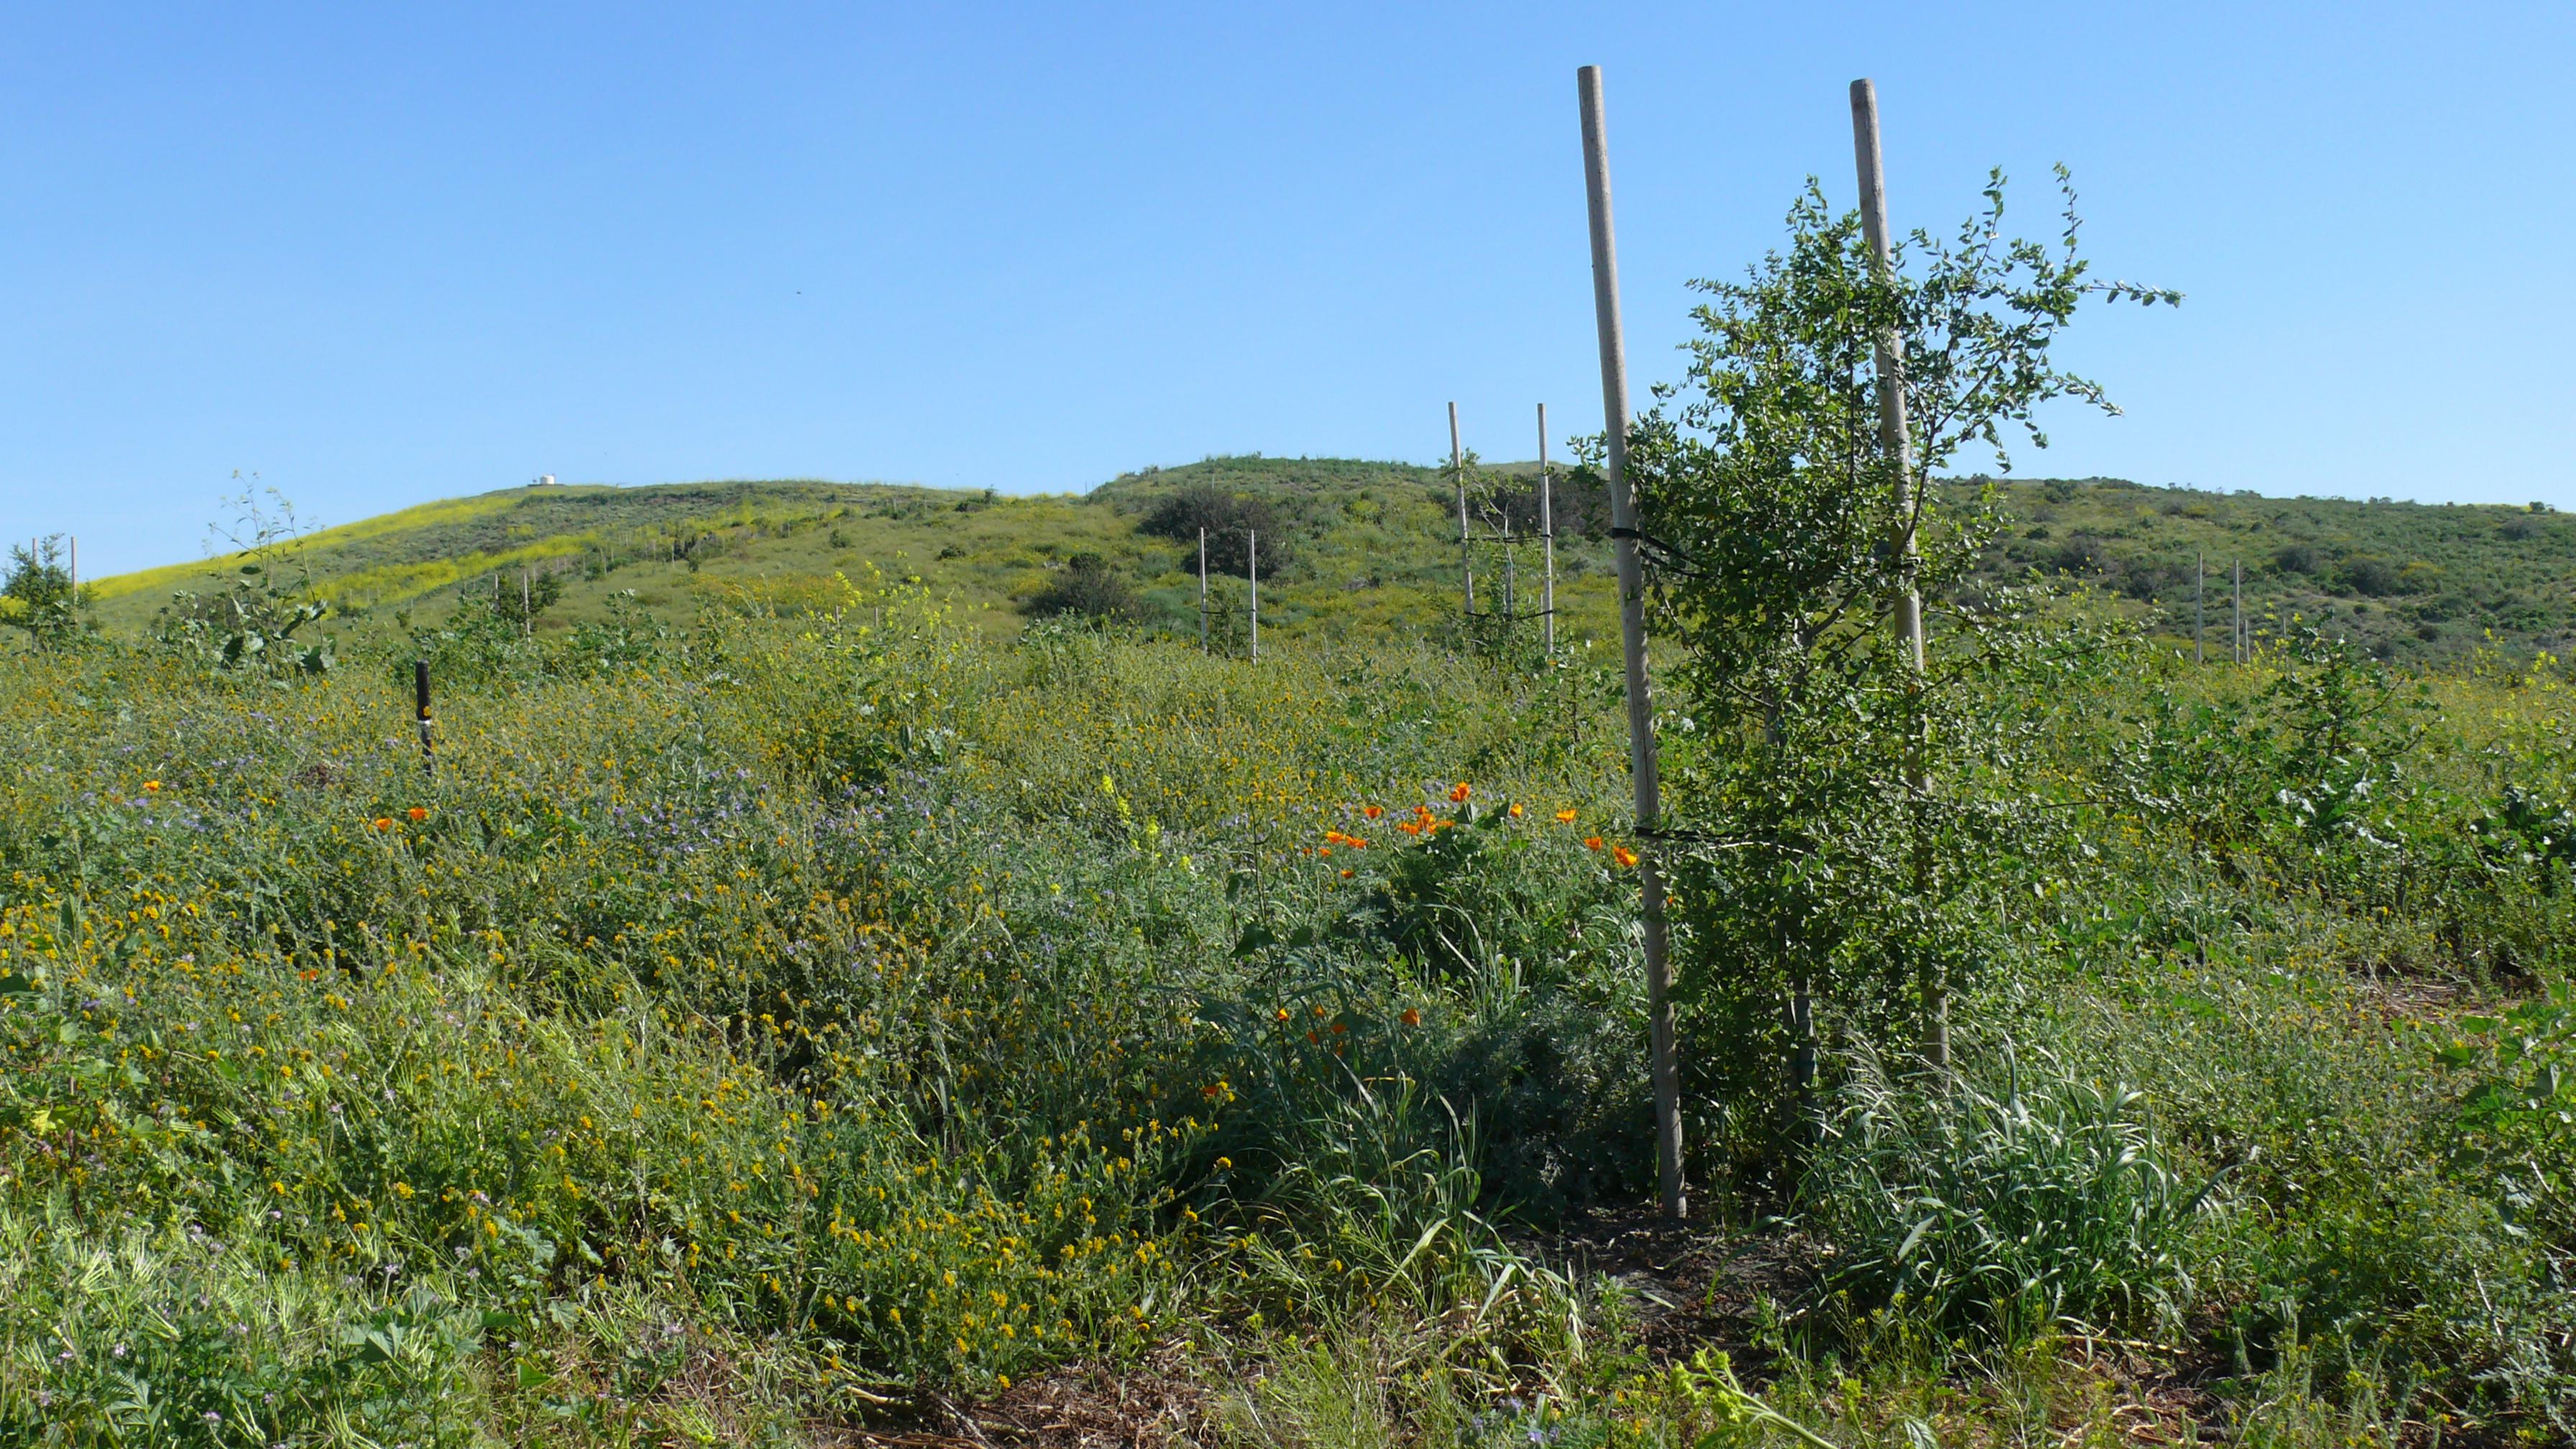 segunda viewshed oak trees with wildflowers